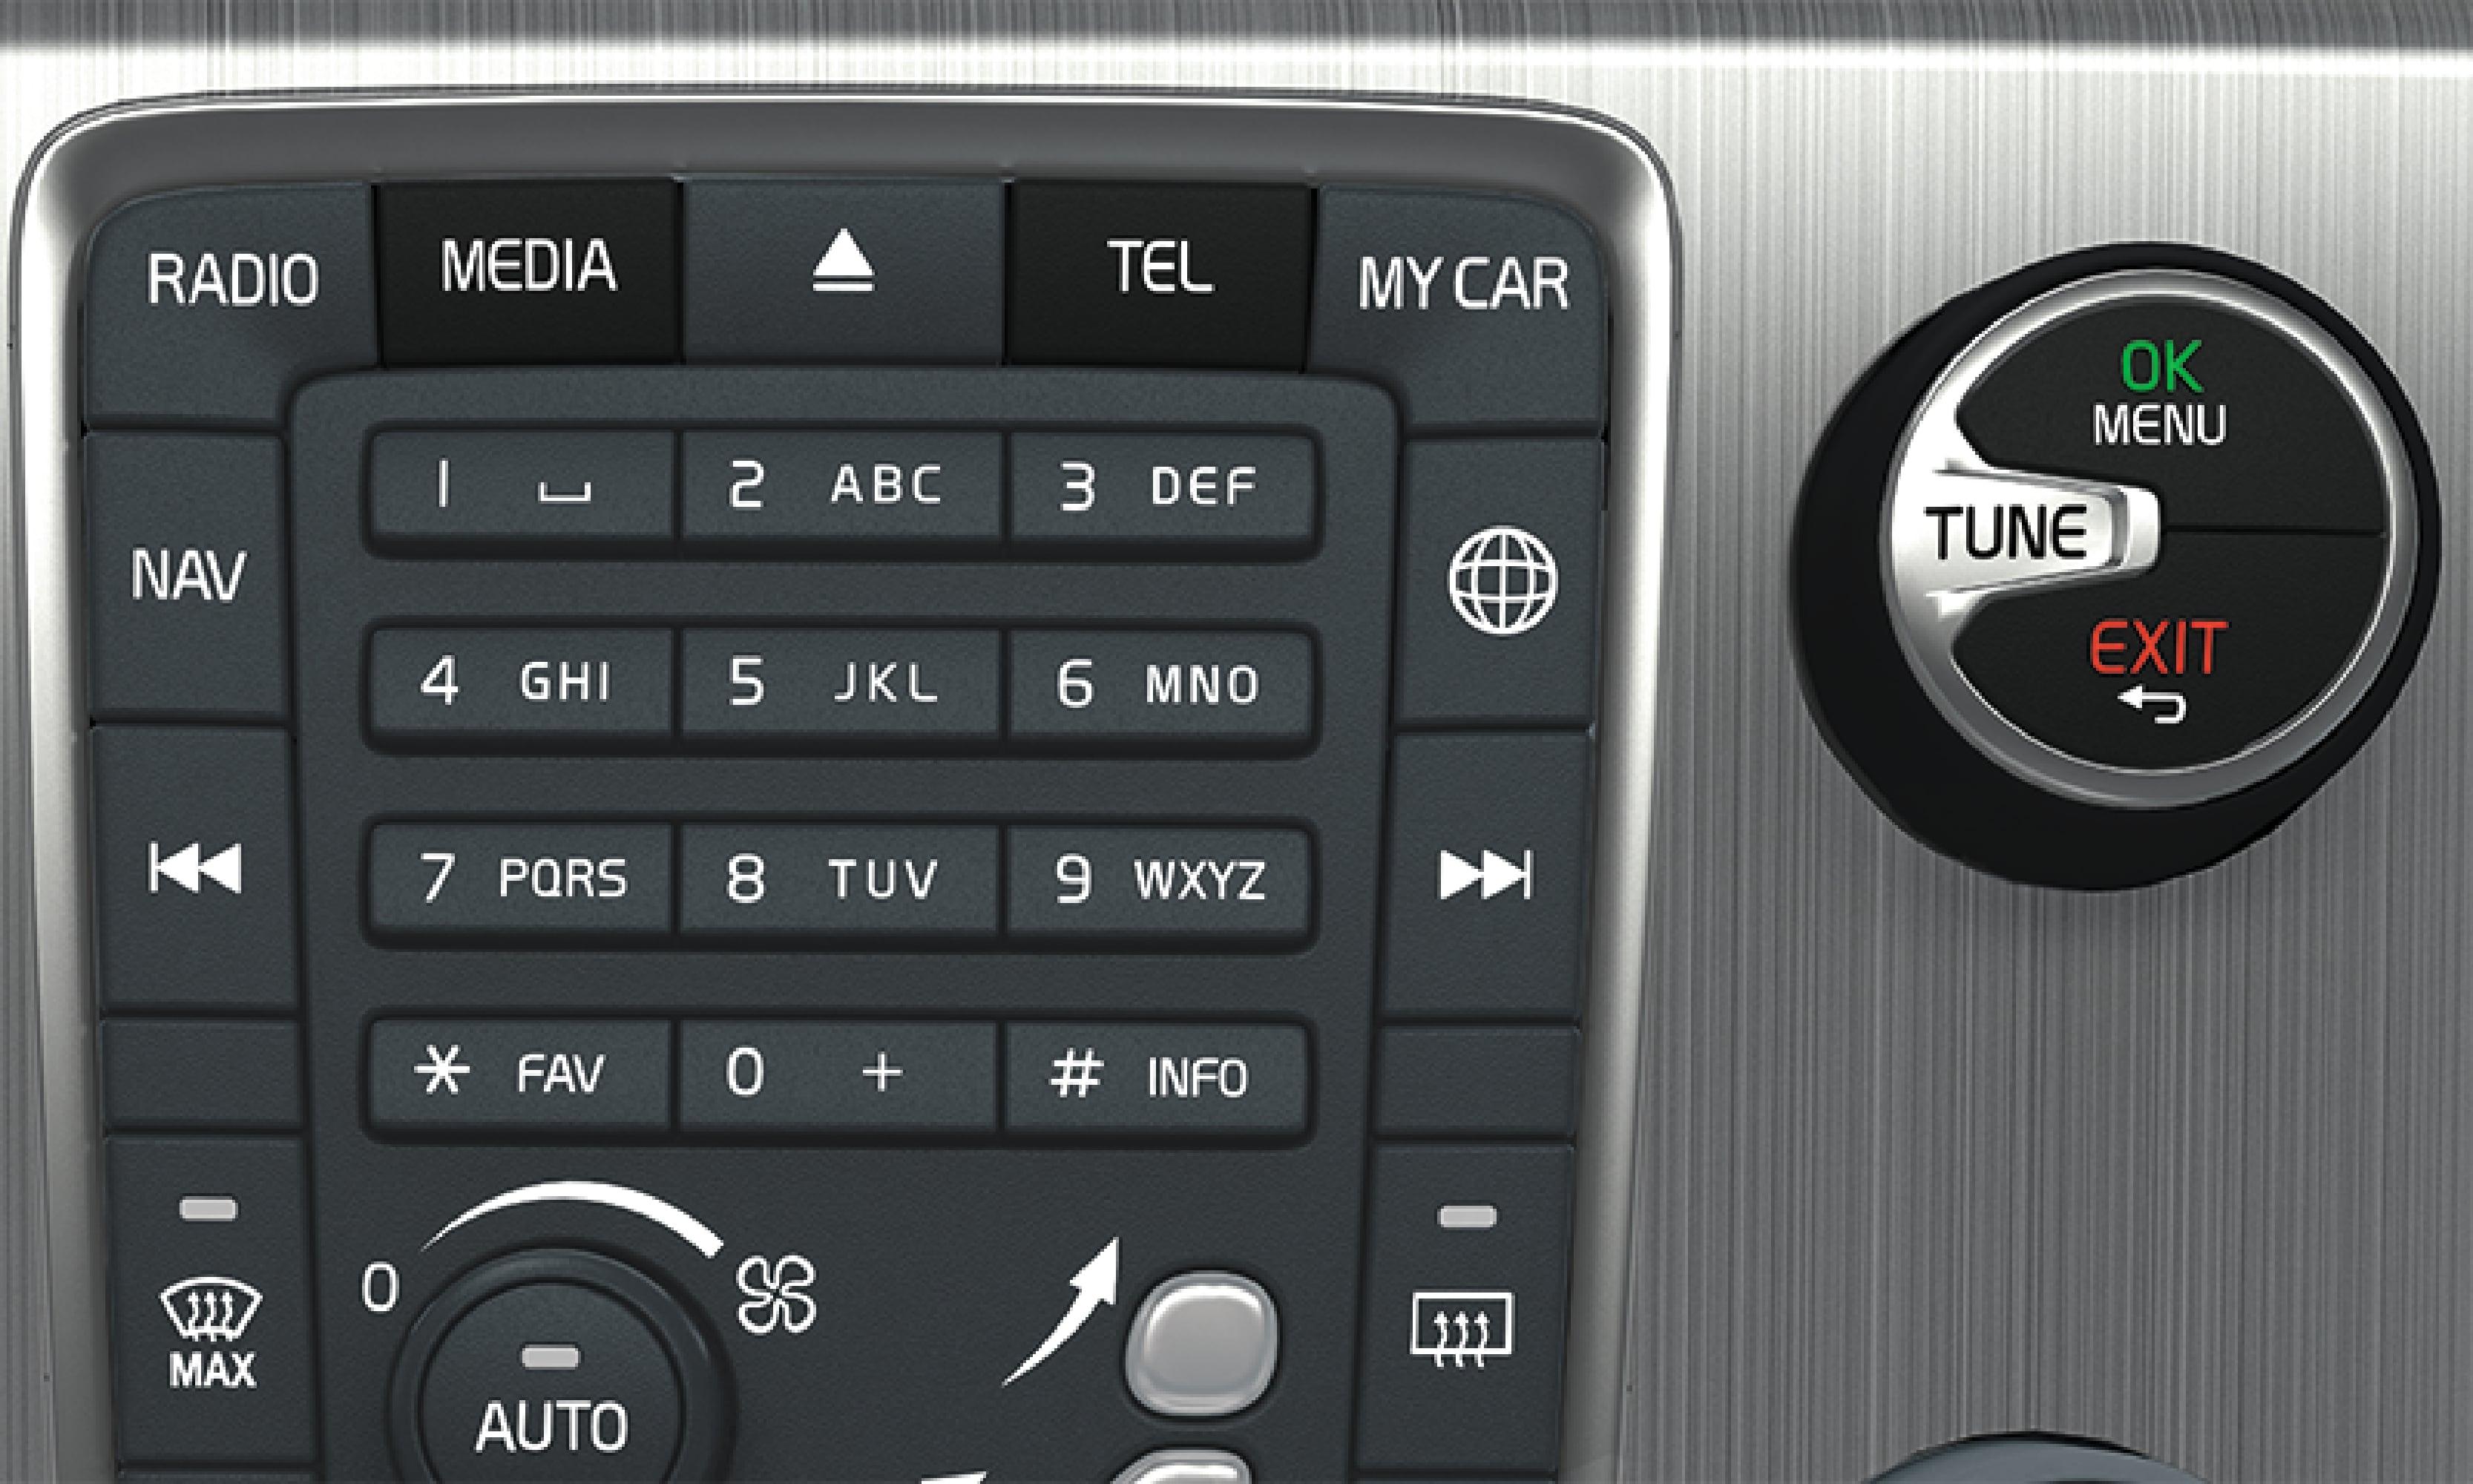 P3/P4 - Support site - Center console - TEL/MEDIA